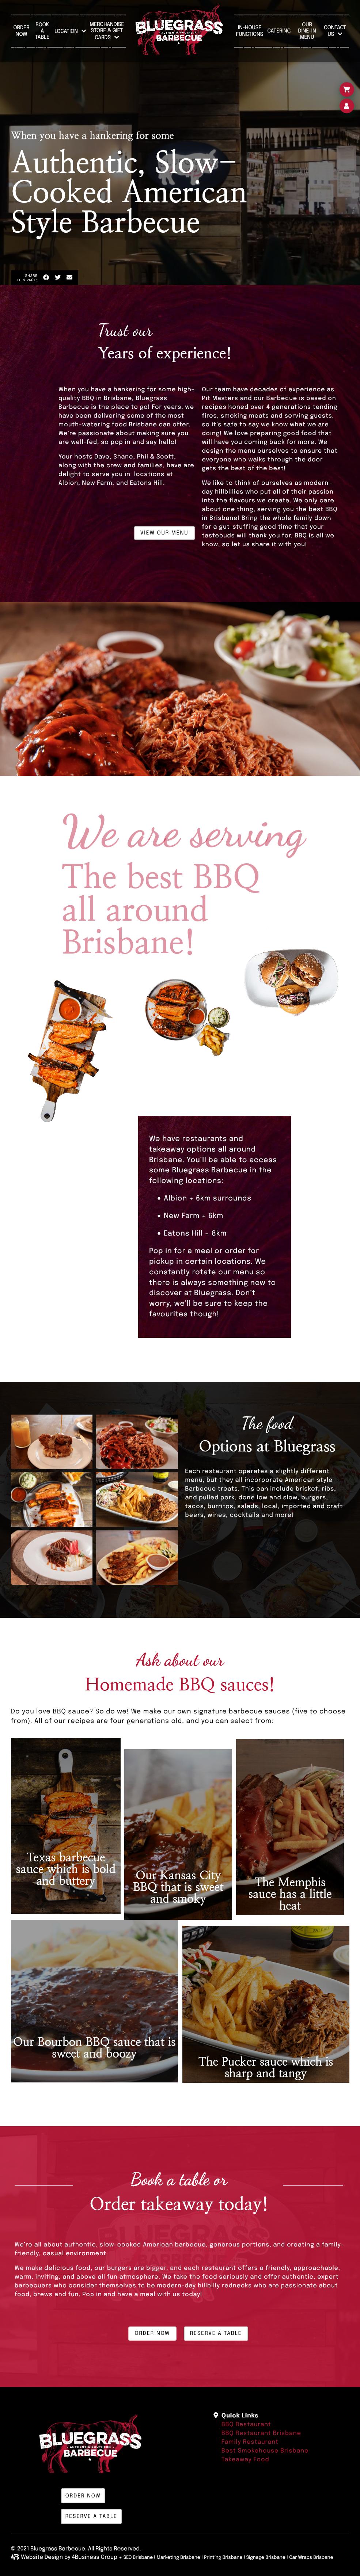 Bluegrass BBQ: Mobile View